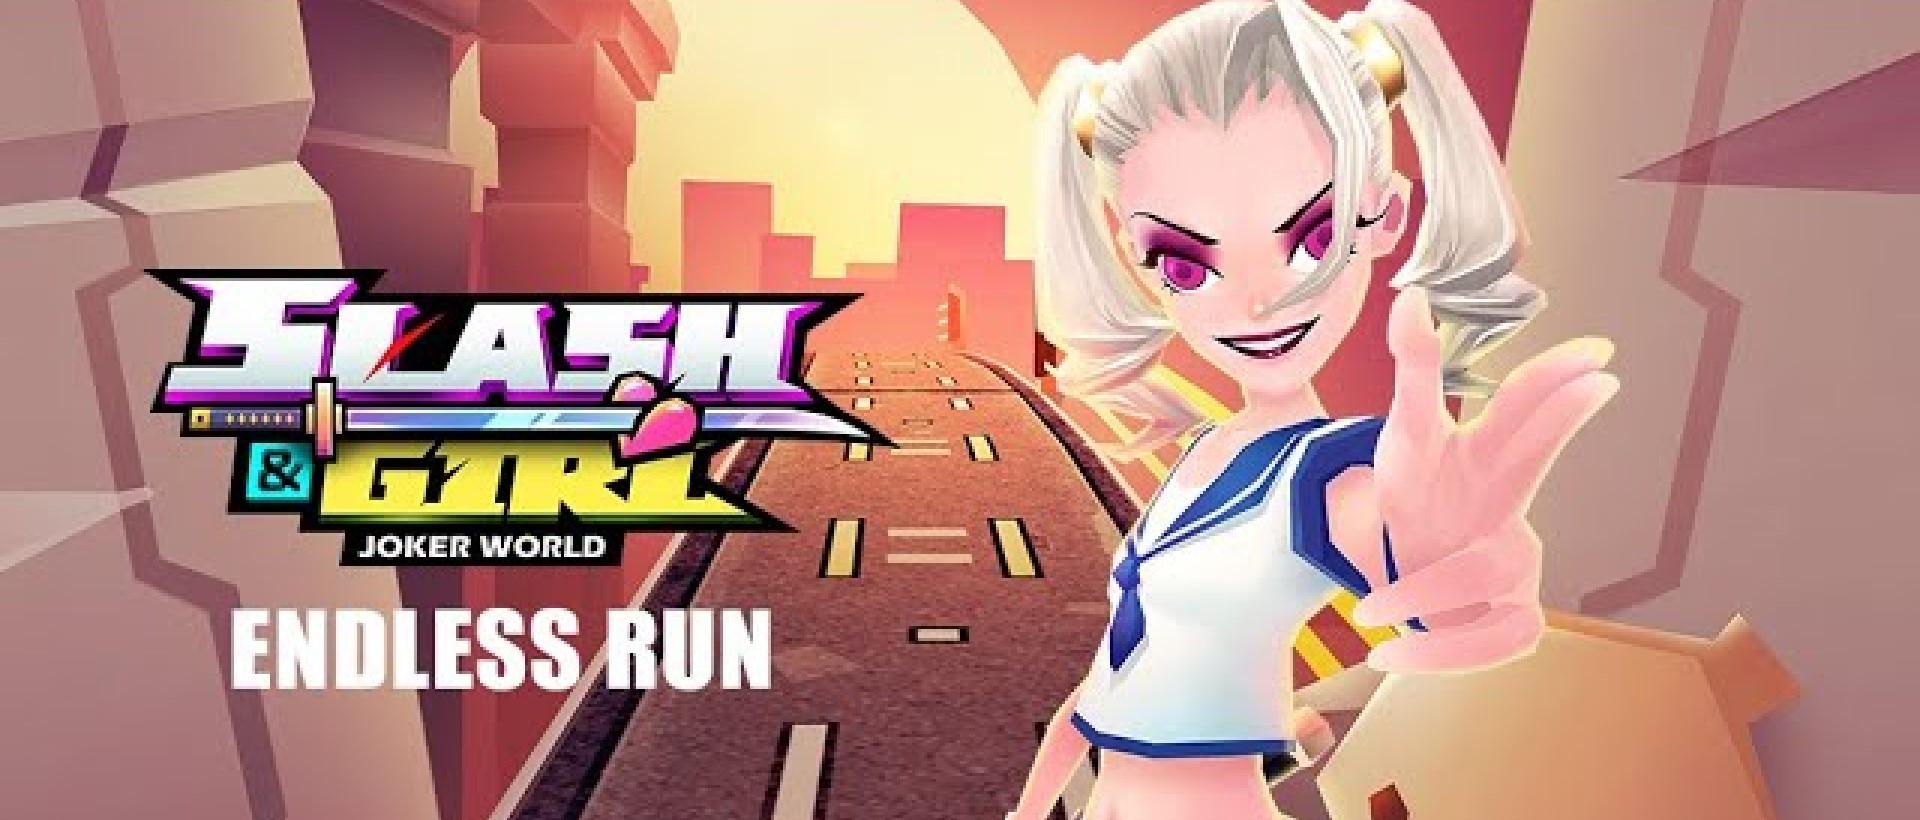 Slash & Girl - Endless Run